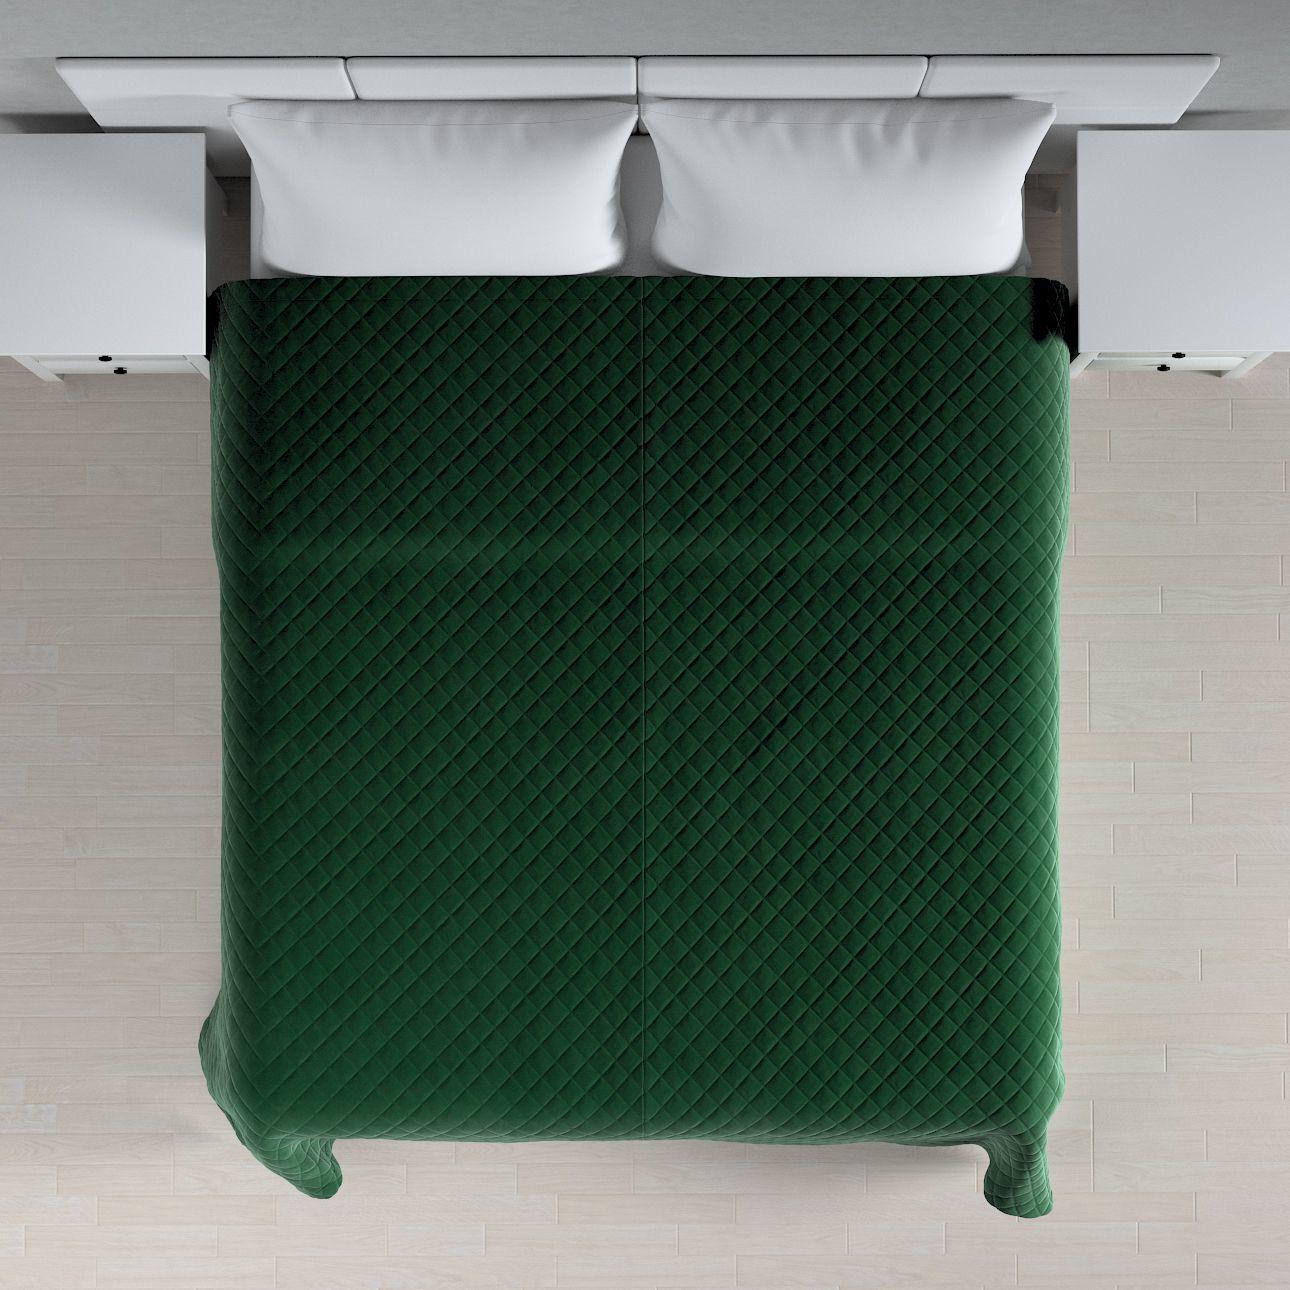 Narzuta pikowana w romby, butelkowa zieleń, szer.260  dł.210 cm, Velvet